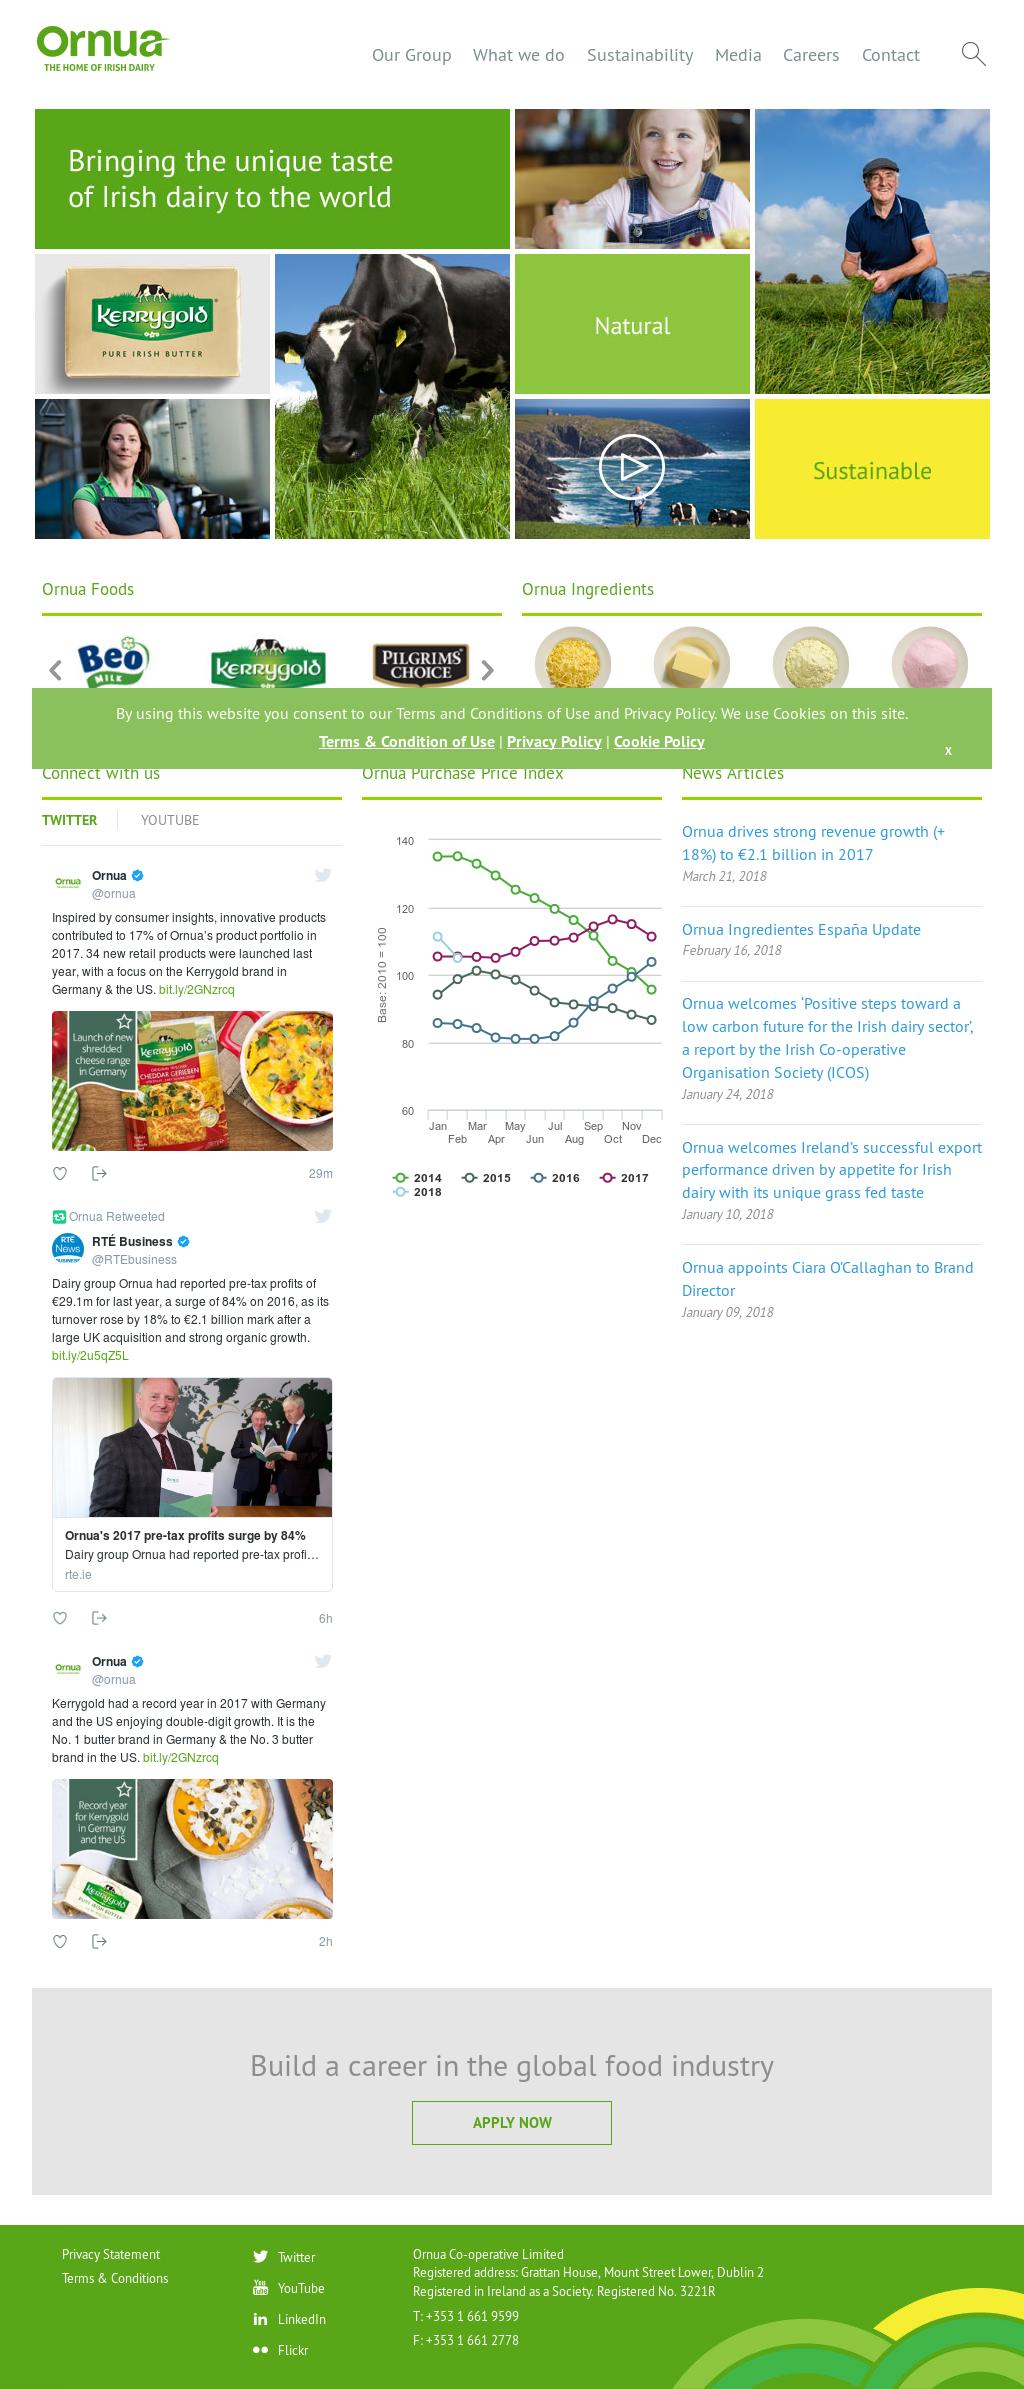 Ornua Competitors, Revenue and Employees - Owler Company Profile